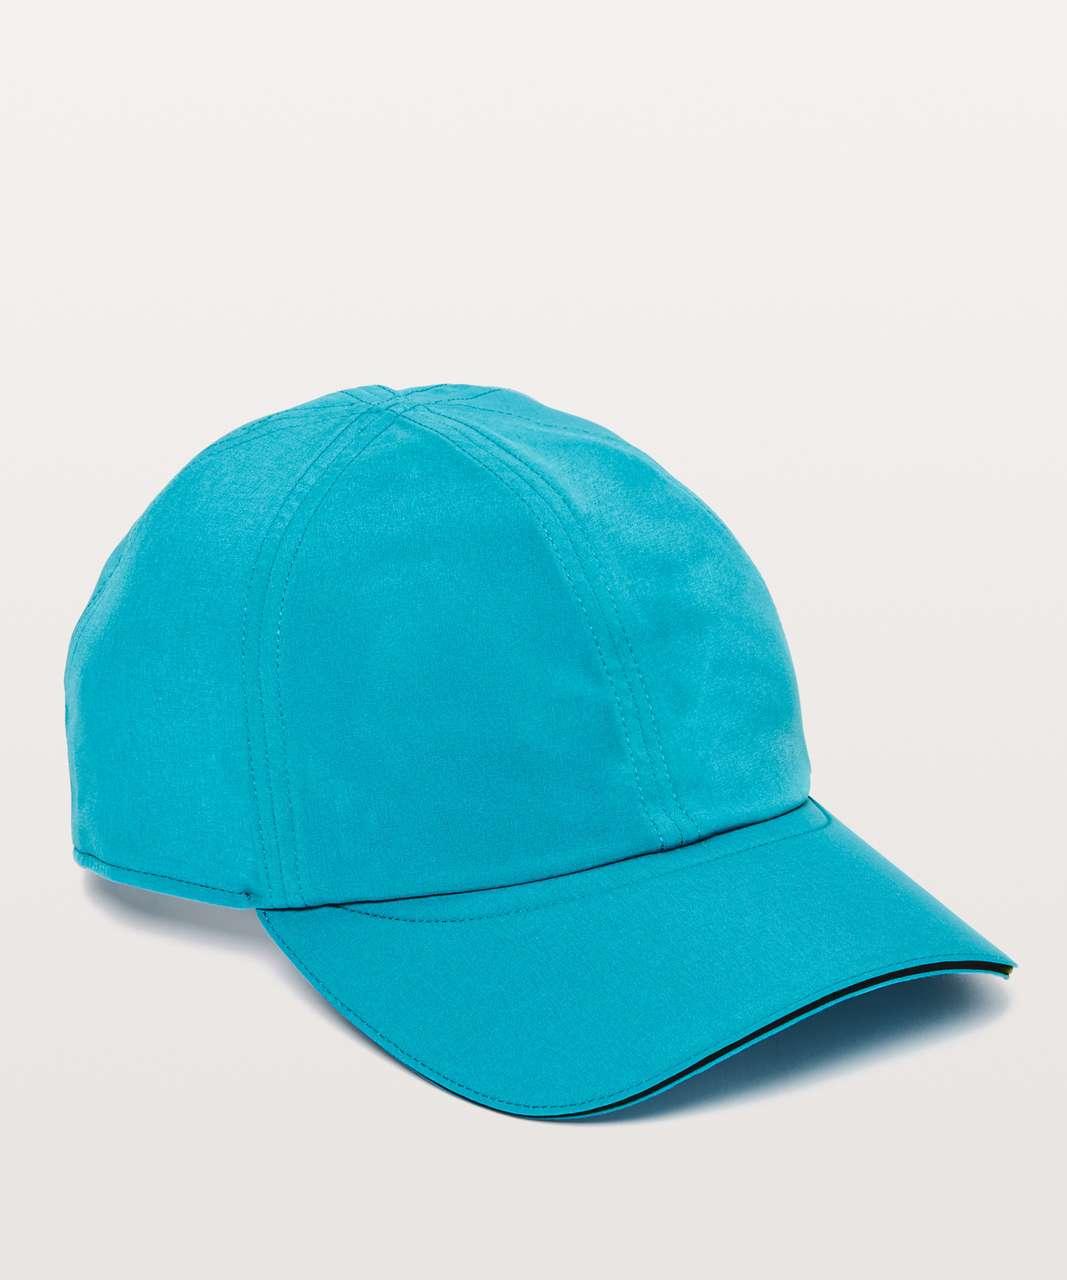 Lululemon Lightspeed Run Hat - Cyprus